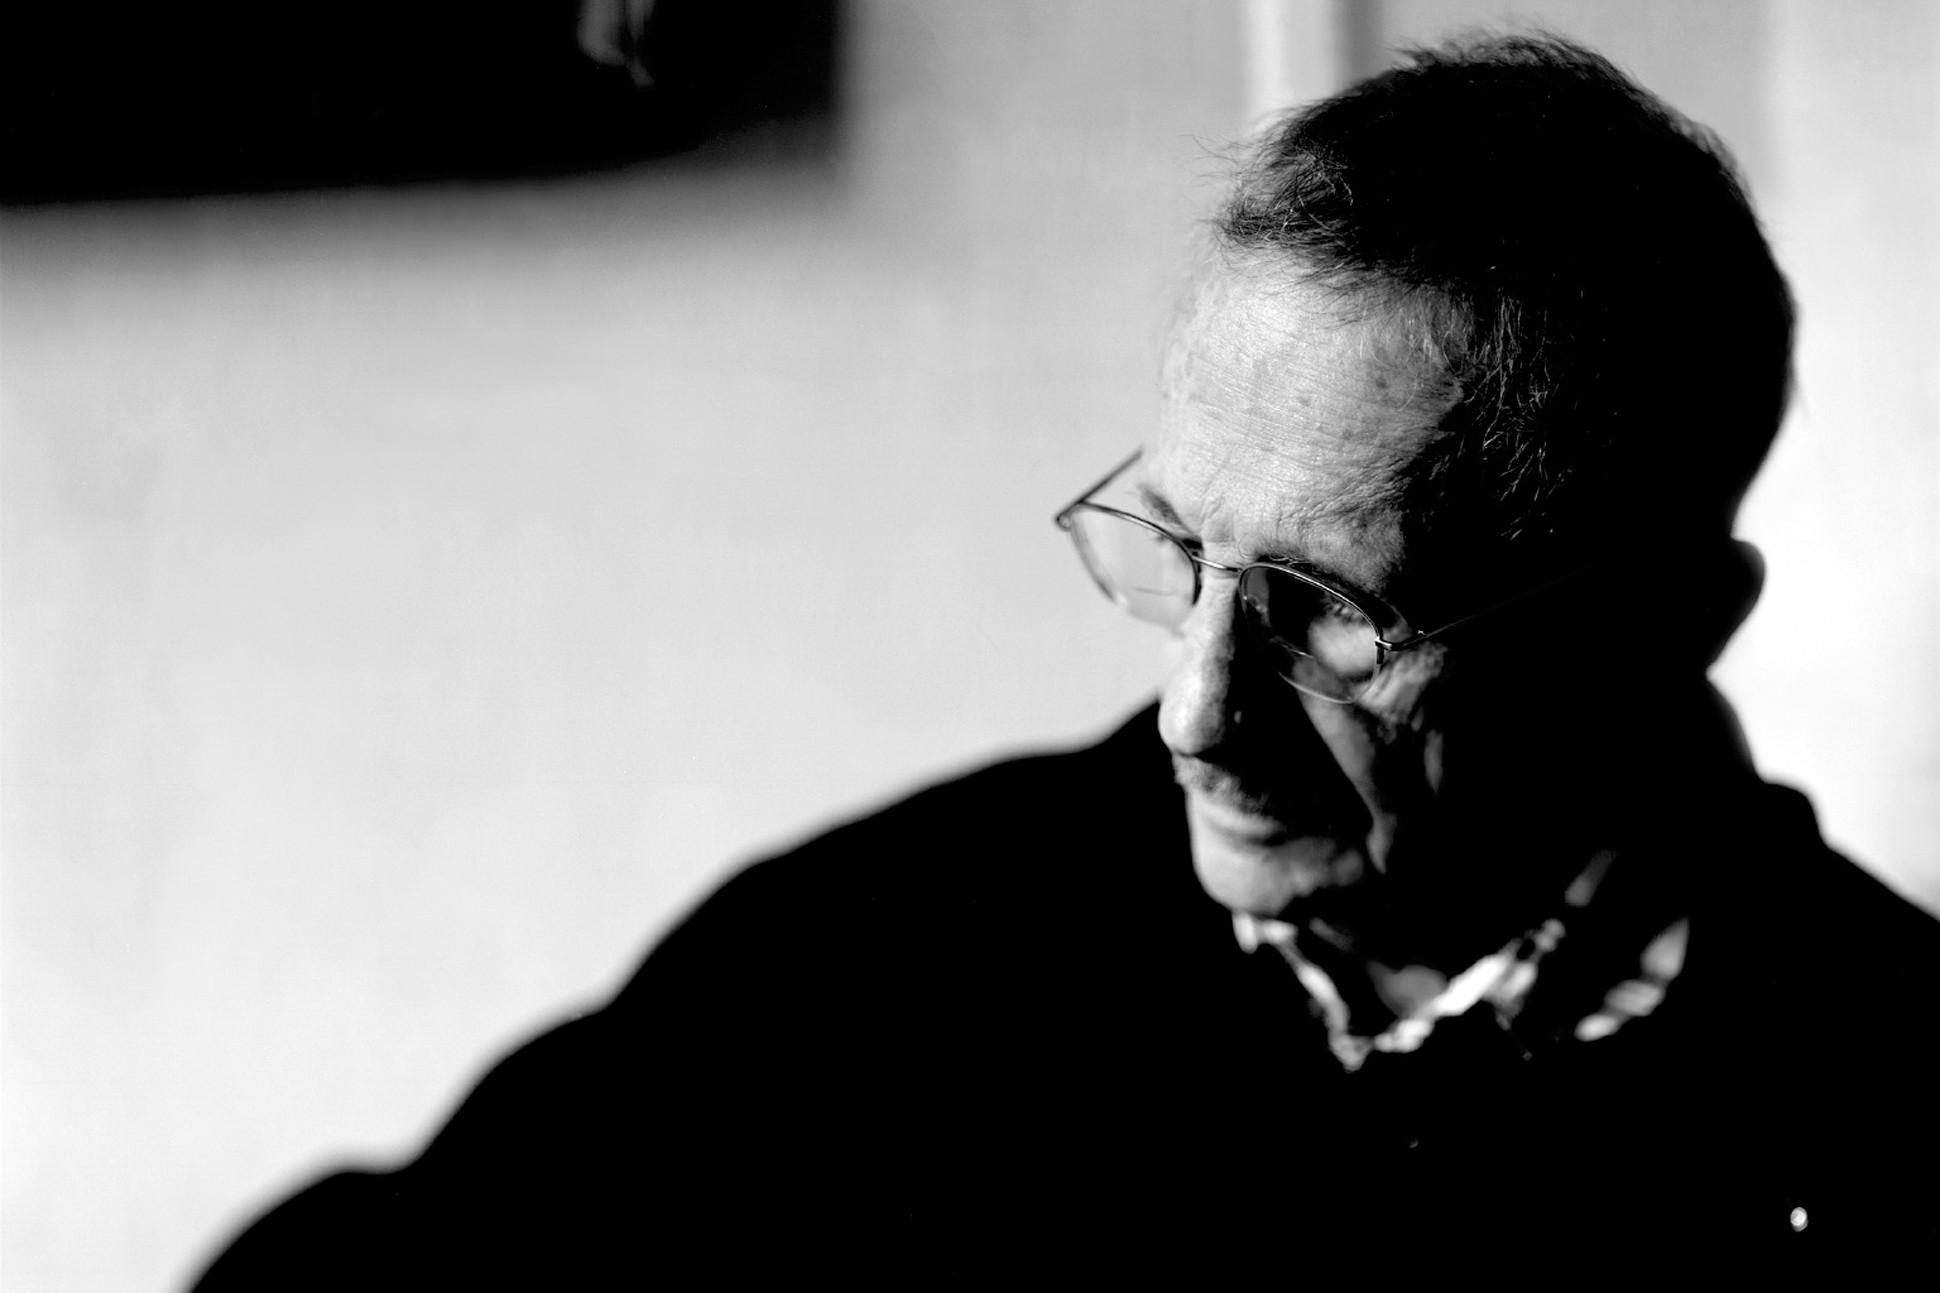 Black and white image of Philip Levine